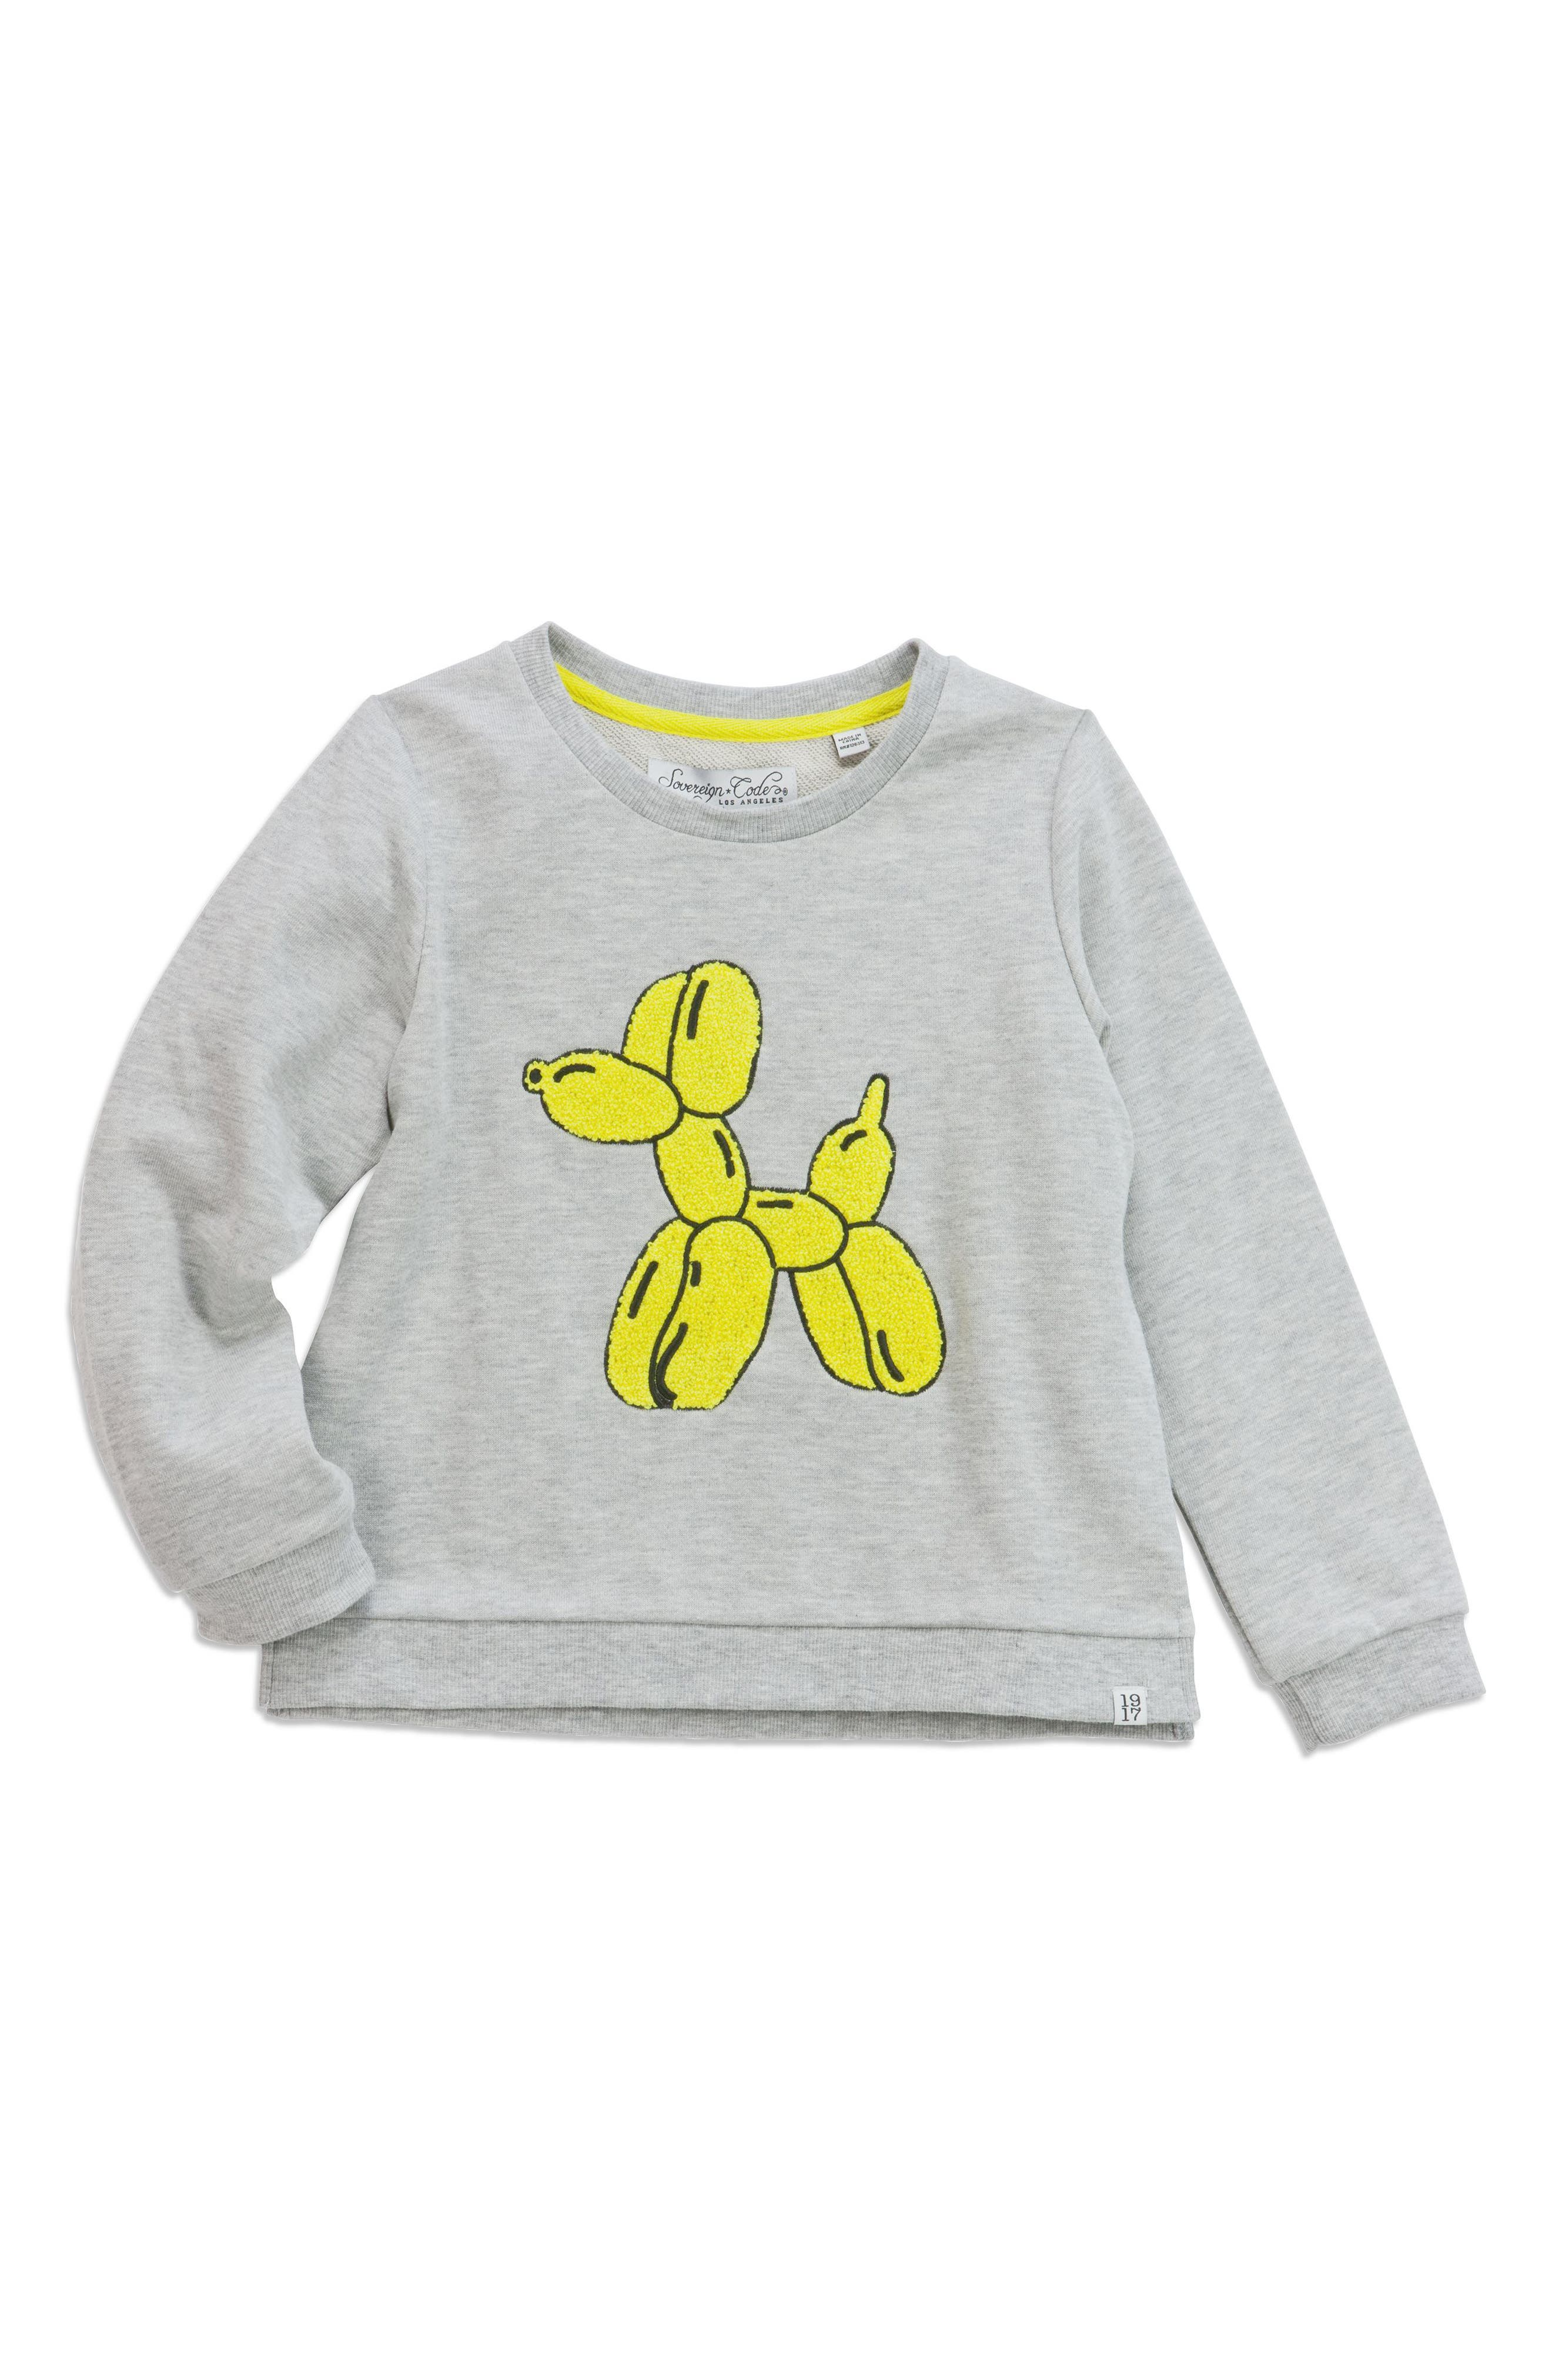 Woah Sweatshirt,                         Main,                         color,